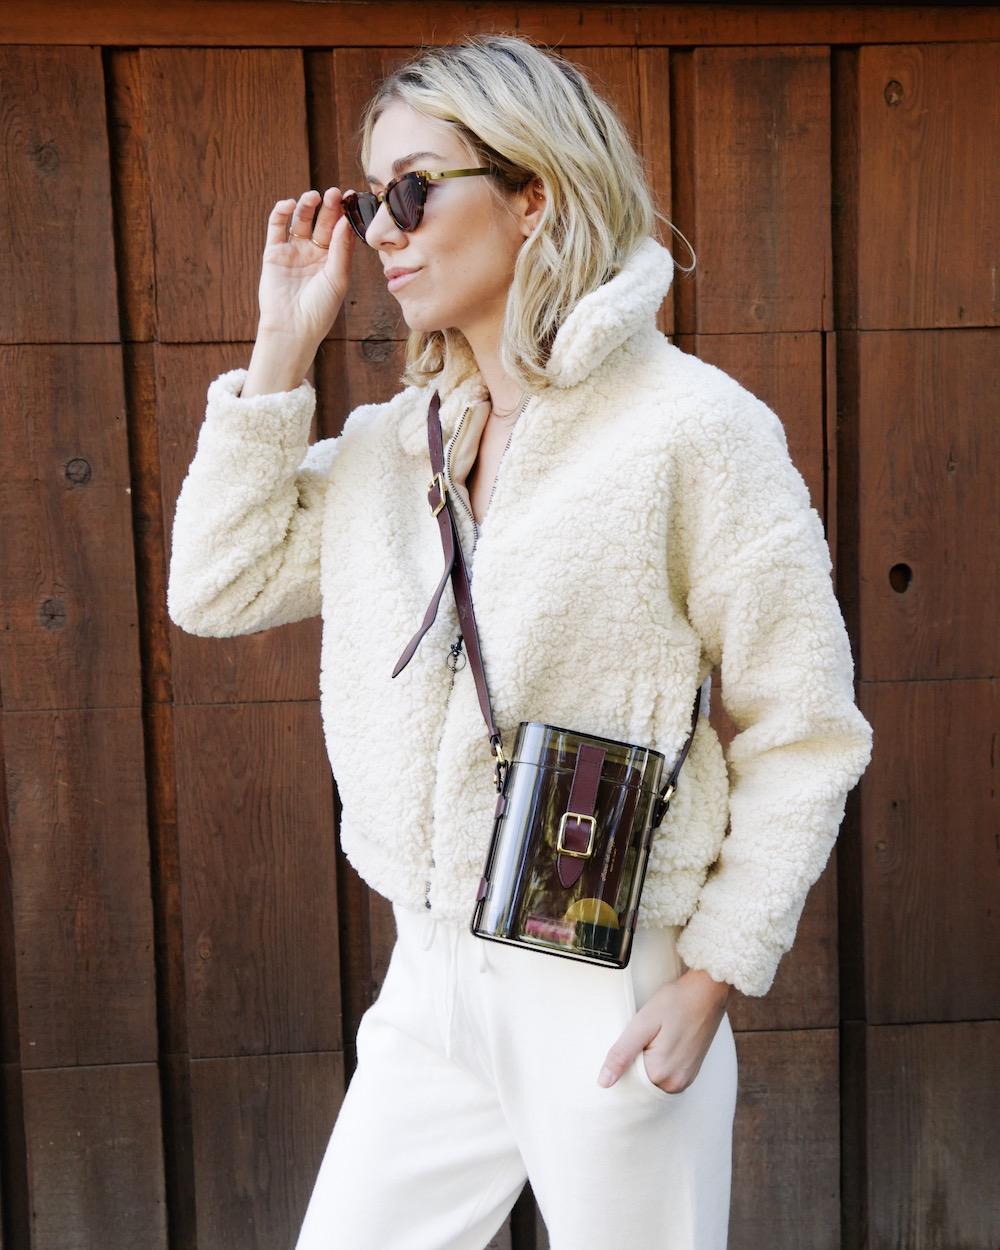 #fauxfur #fauxfurcoat #Fauxfurjacket #teddycoat #oversizedjacket #fallstyle #fallguide #jacketsforwomen #jacketfashion #jacketsideas #coatsforwomen #coat #coatsjackets #cuteoutfits #fallfashioncoats #styleguide #cozyoutfit